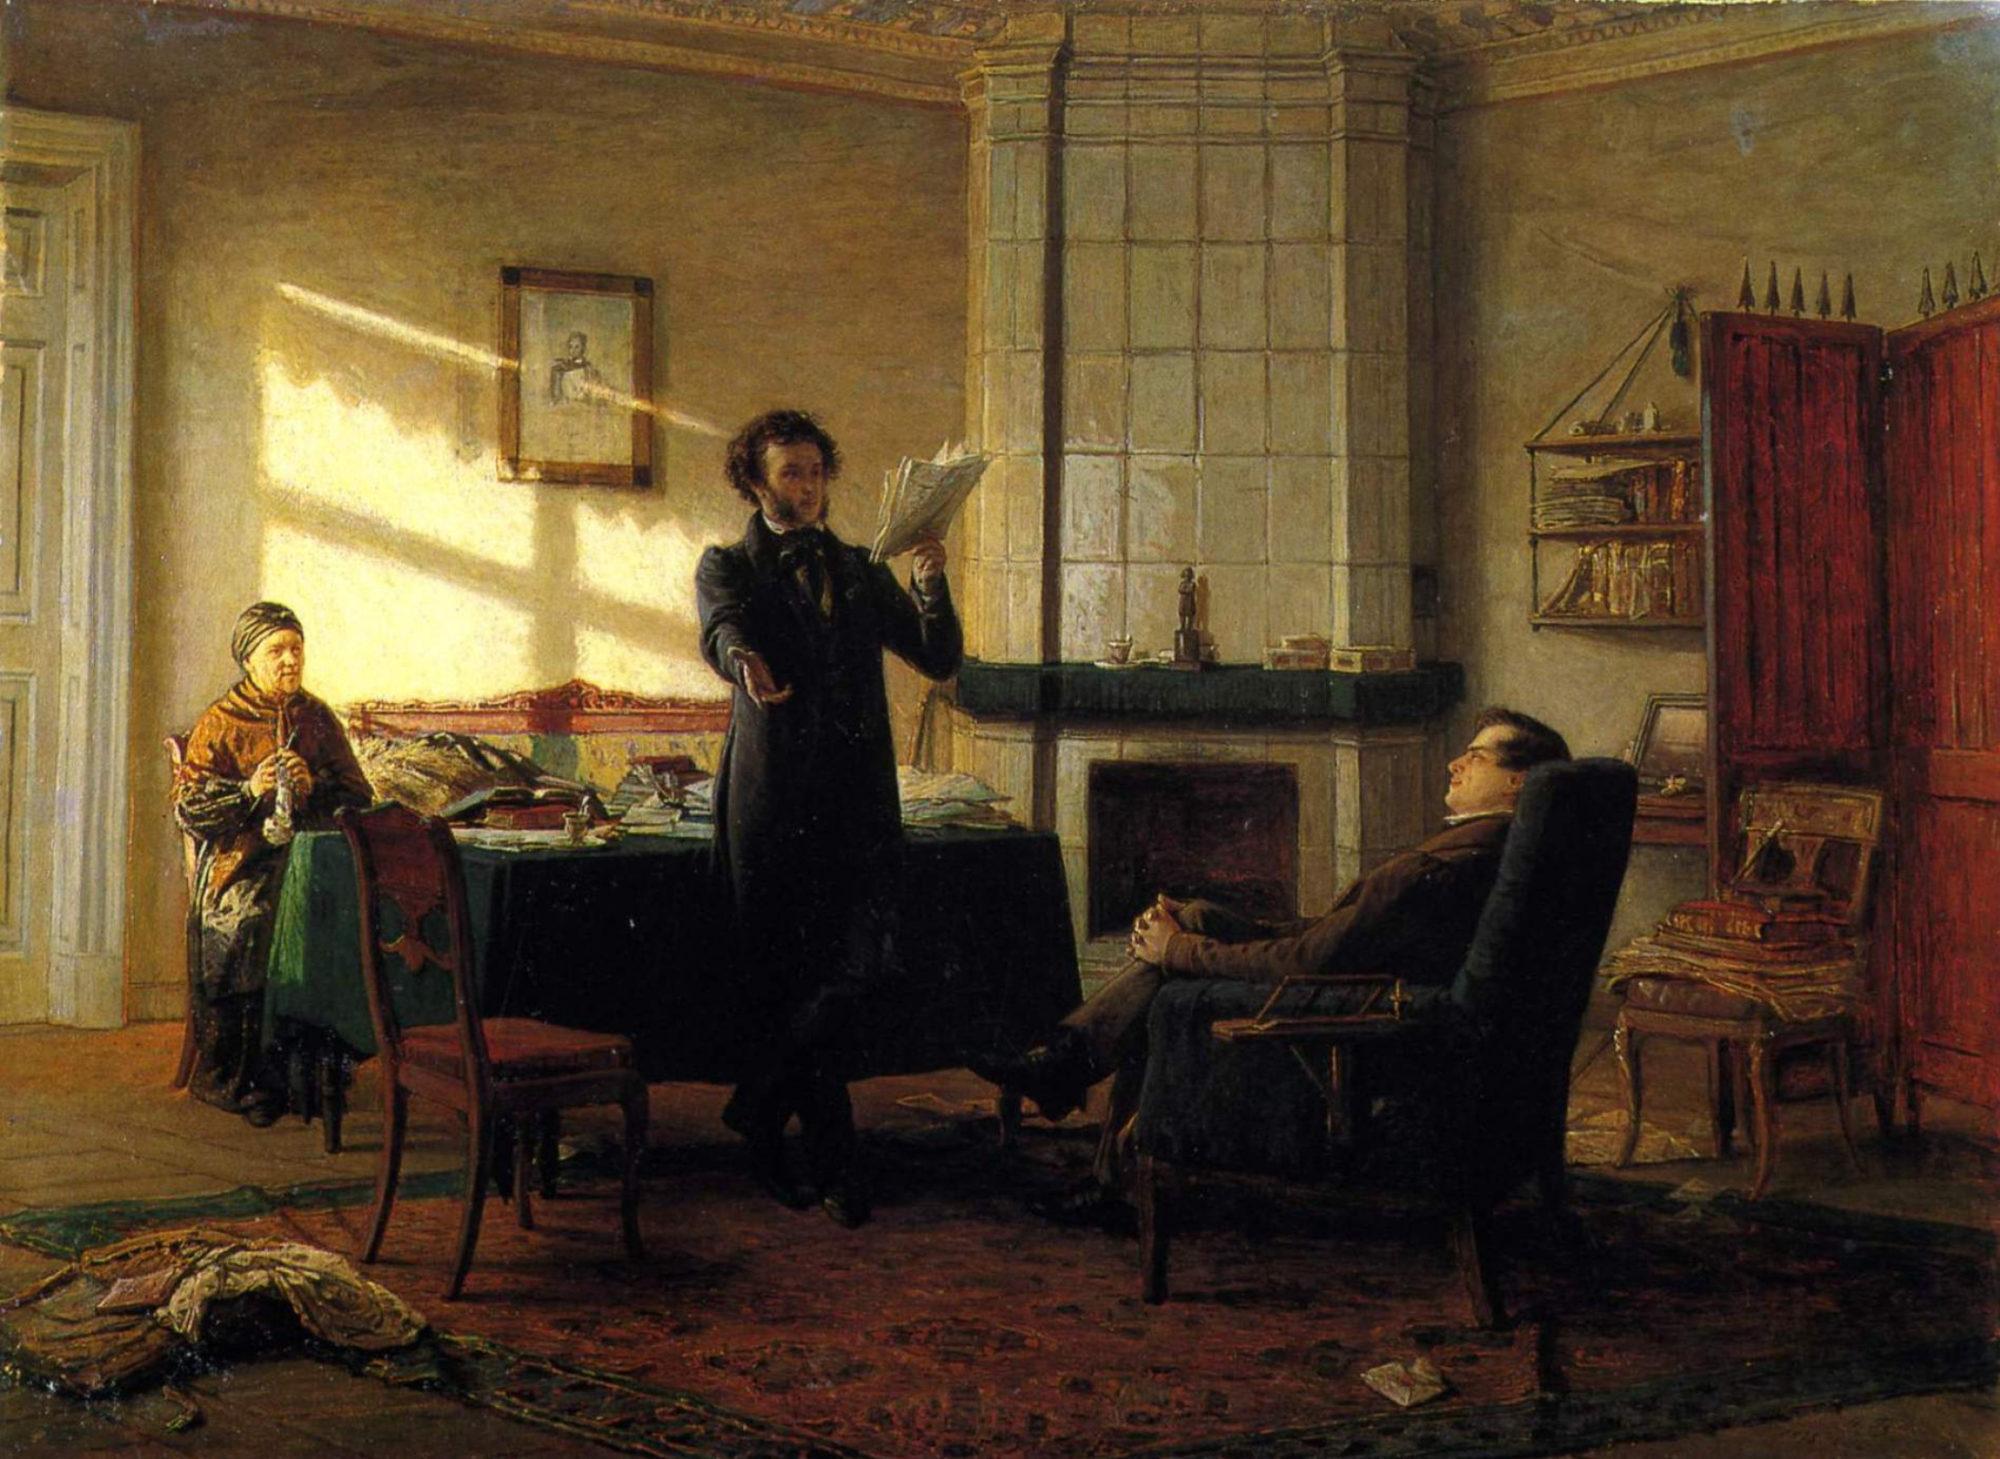 Николай Ге, 1875 год, картина «Пушкин в селе Михайловском».